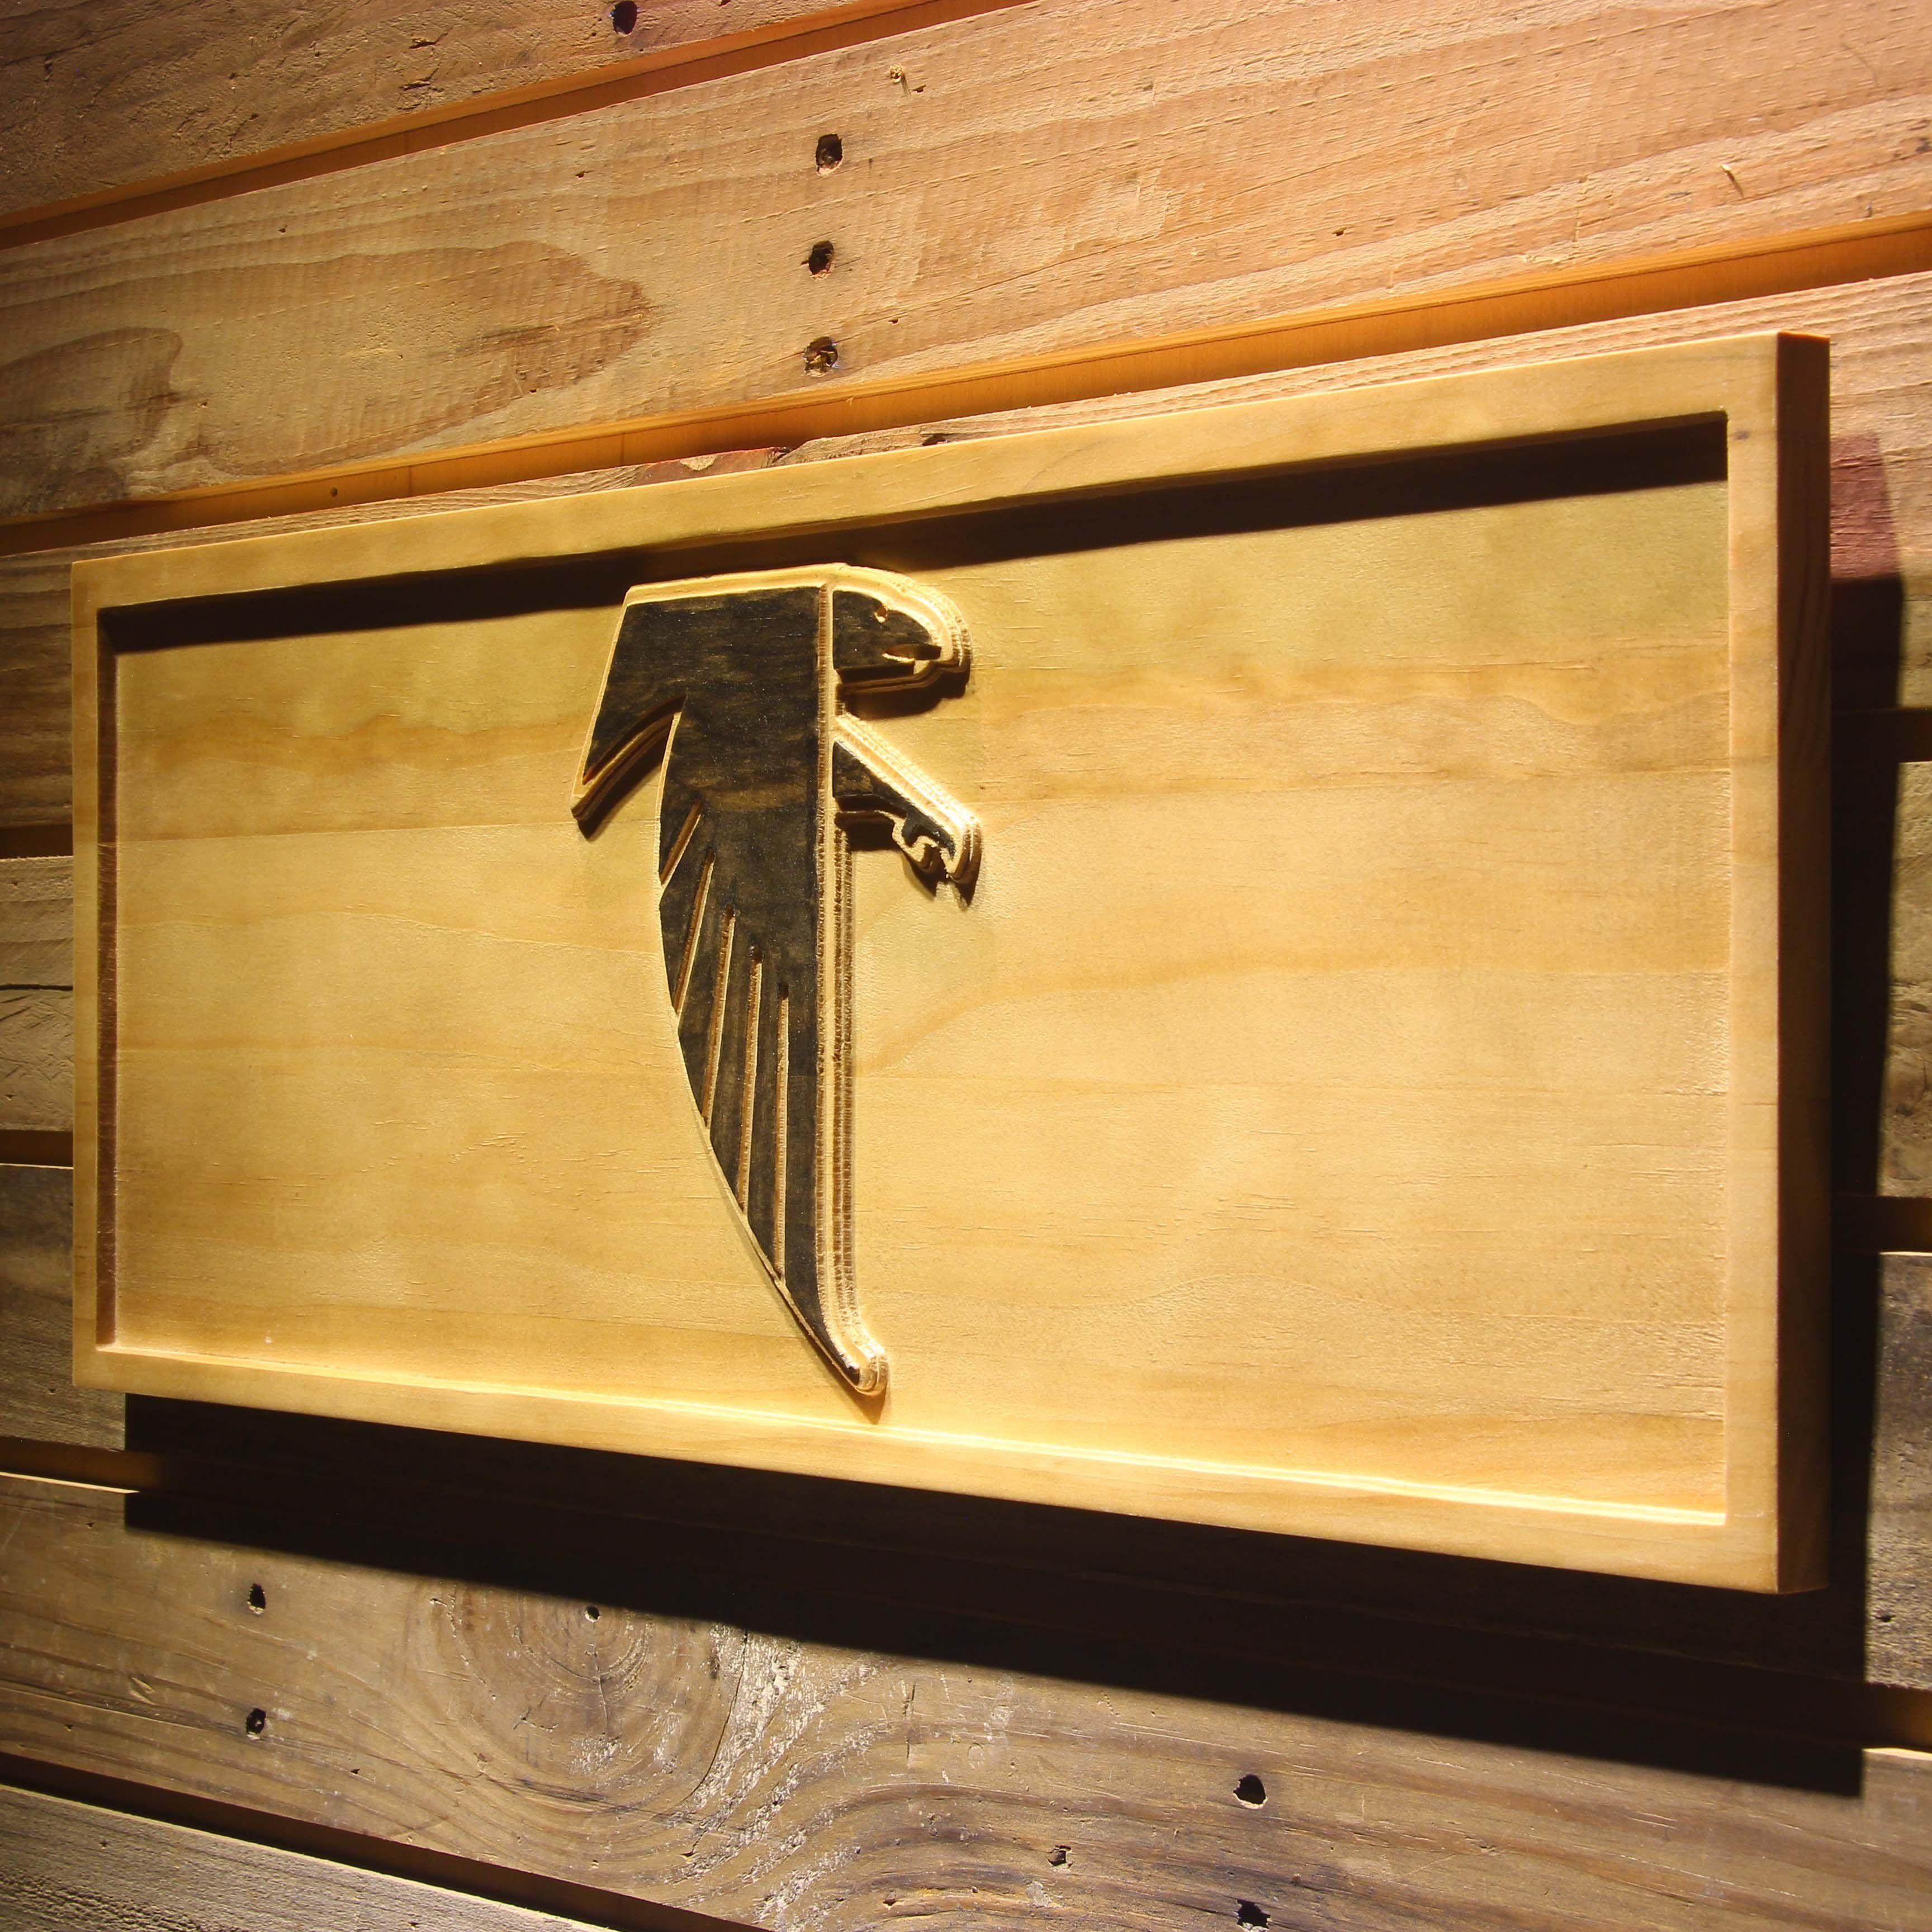 Atlanta Falcons 1990-2002 Wooden Sign - Legacy Edition | Falcons